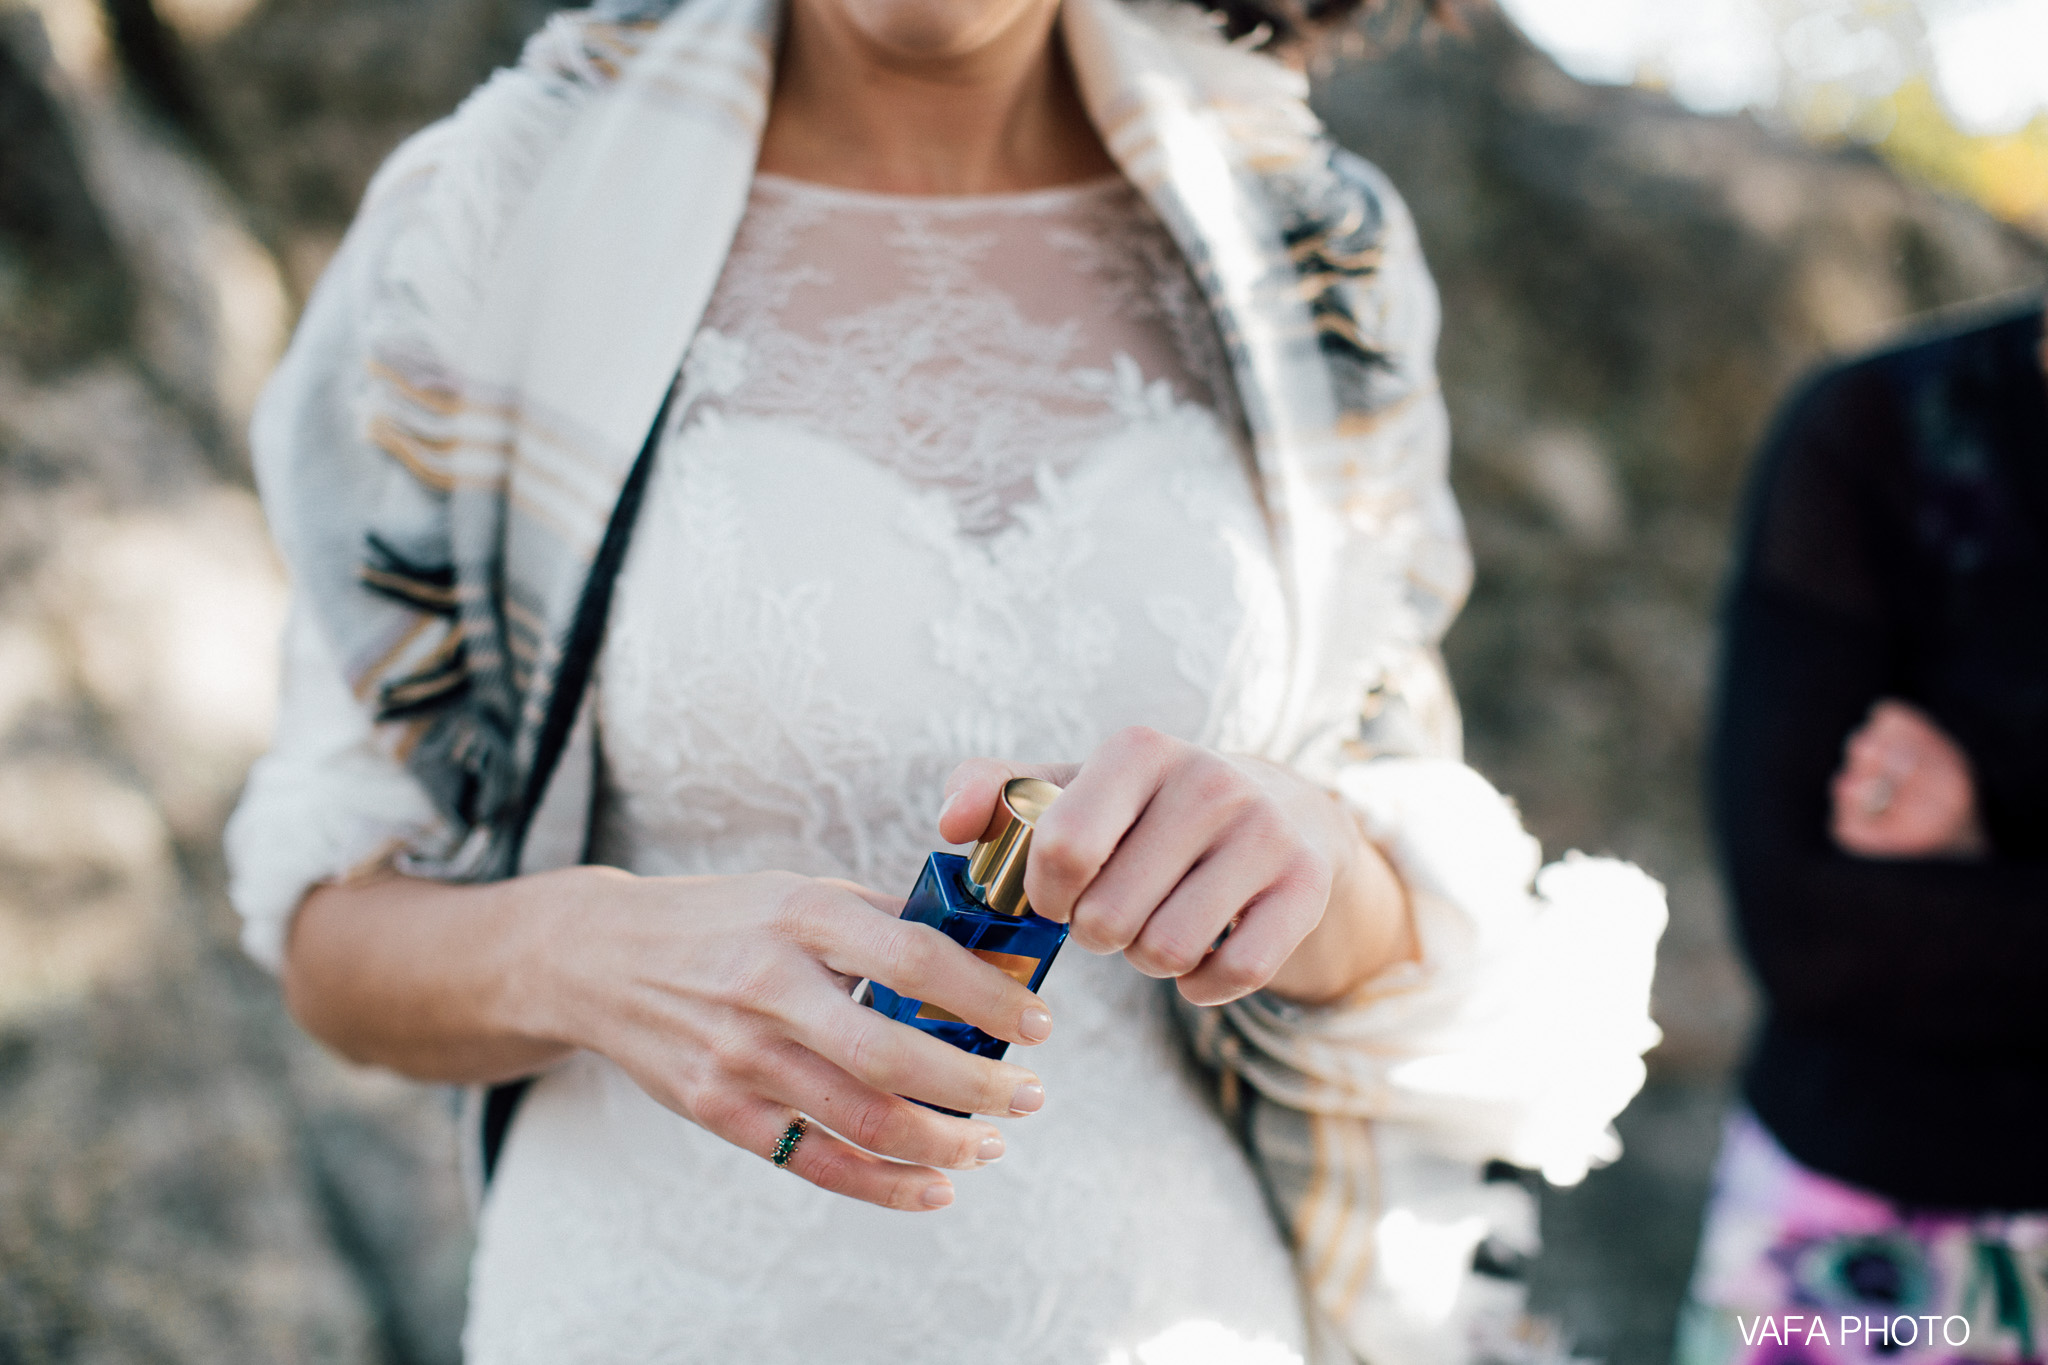 Hogback-Mountain-Wedding-Chelsea-Josh-Vafa-Photo-108.jpg